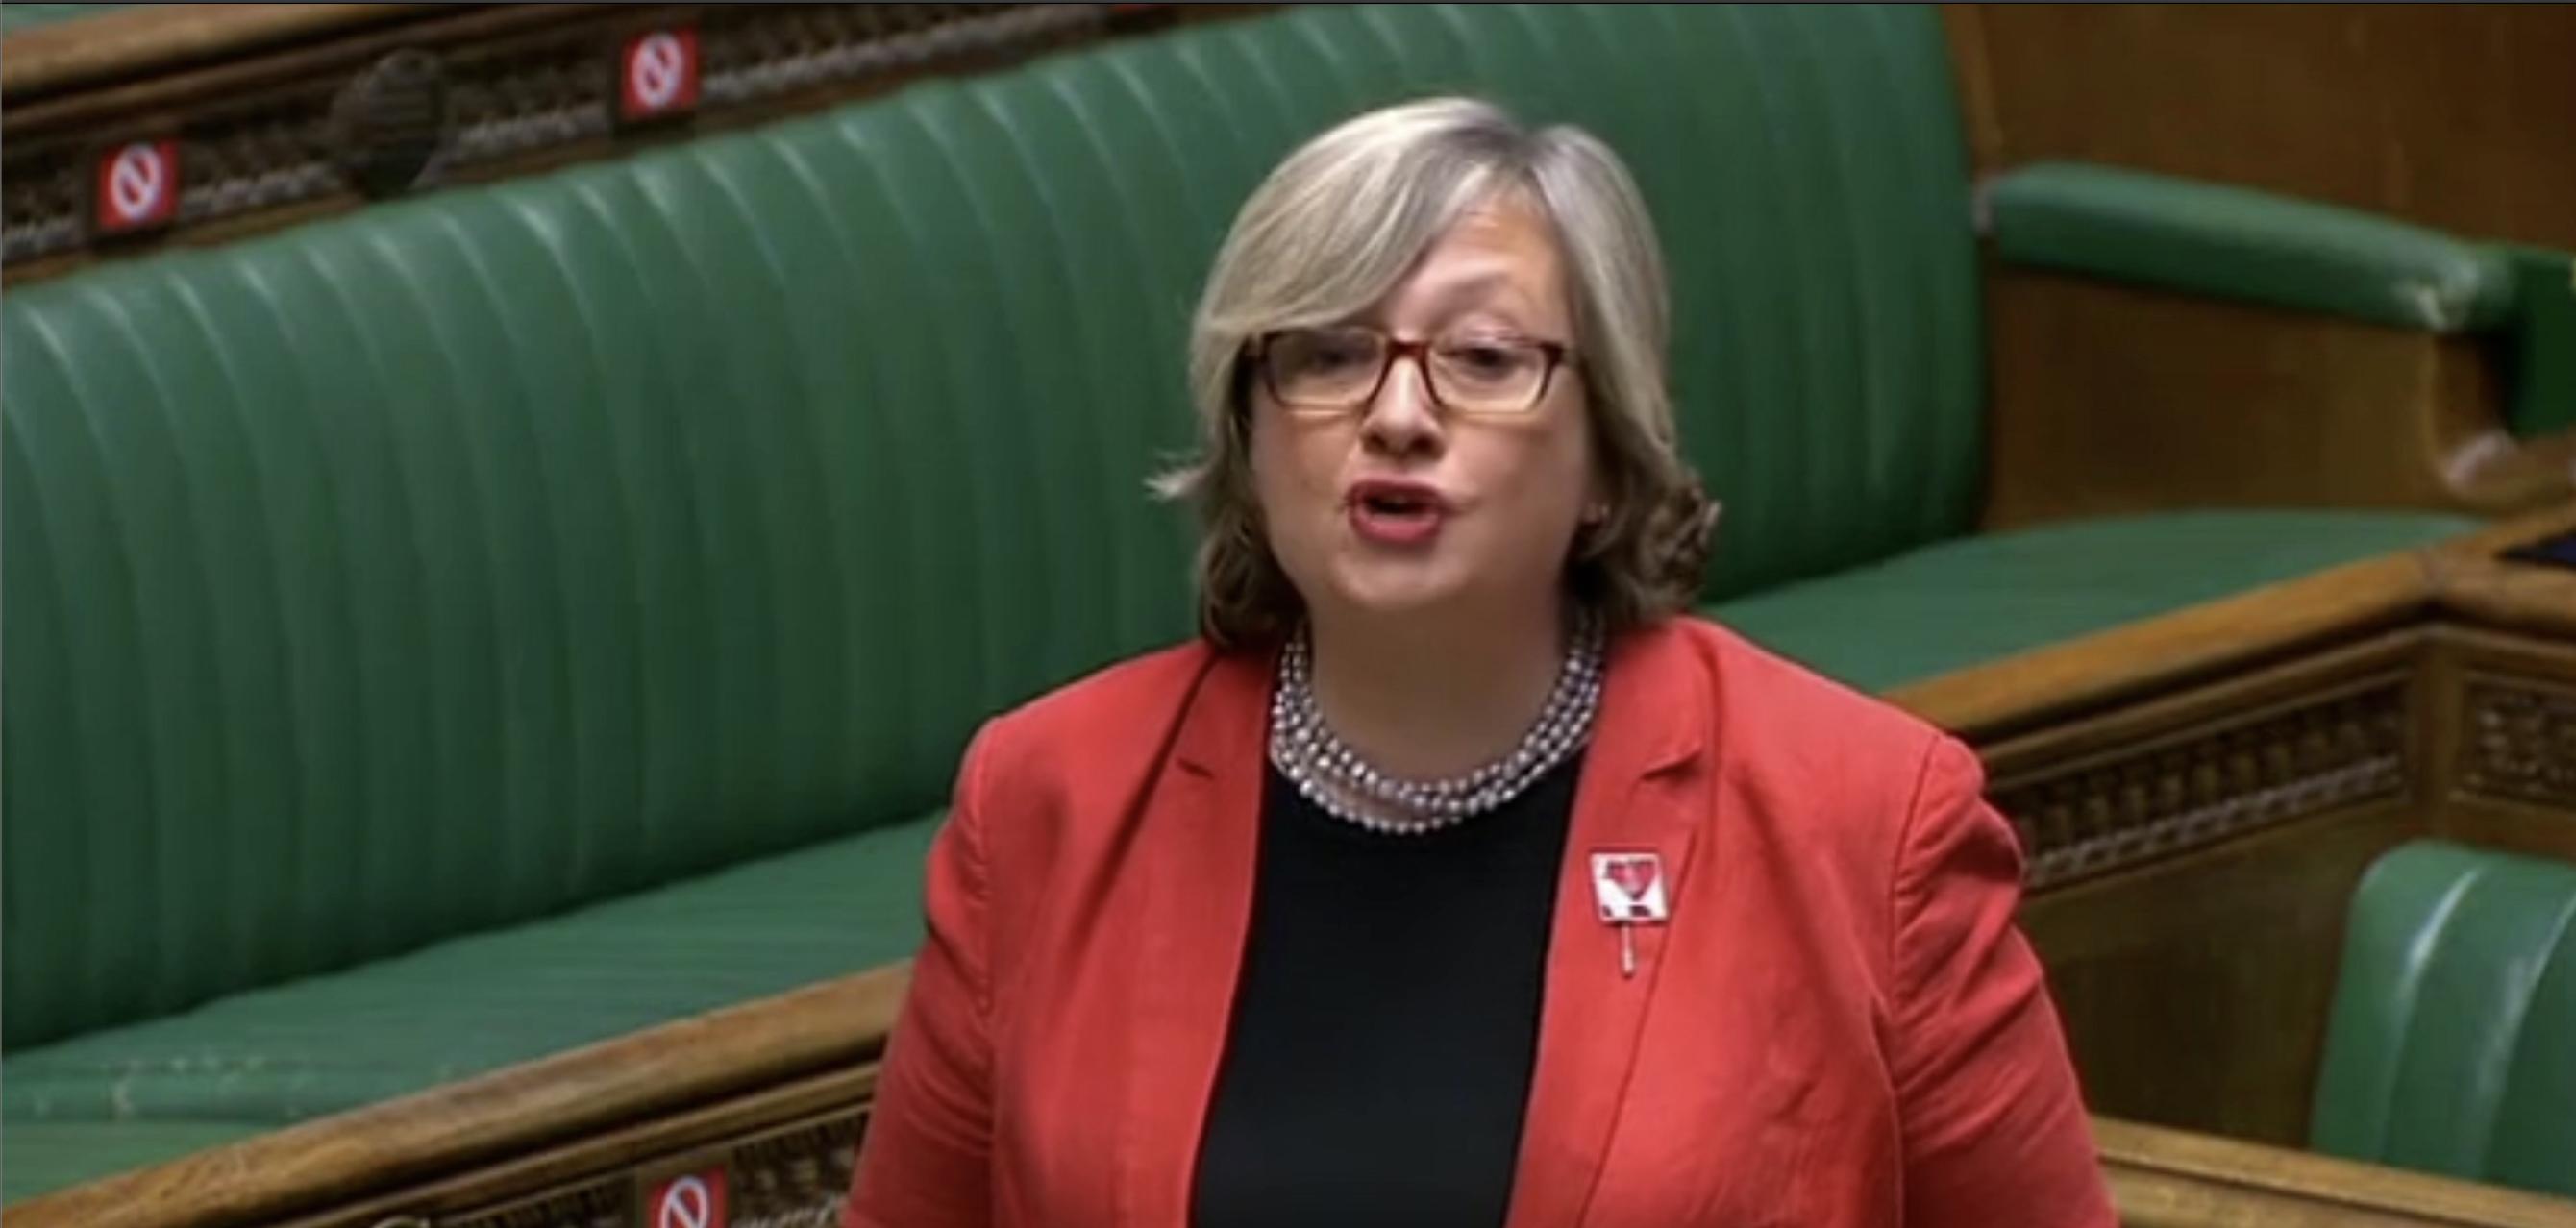 Joanna Cherry, SNP MP